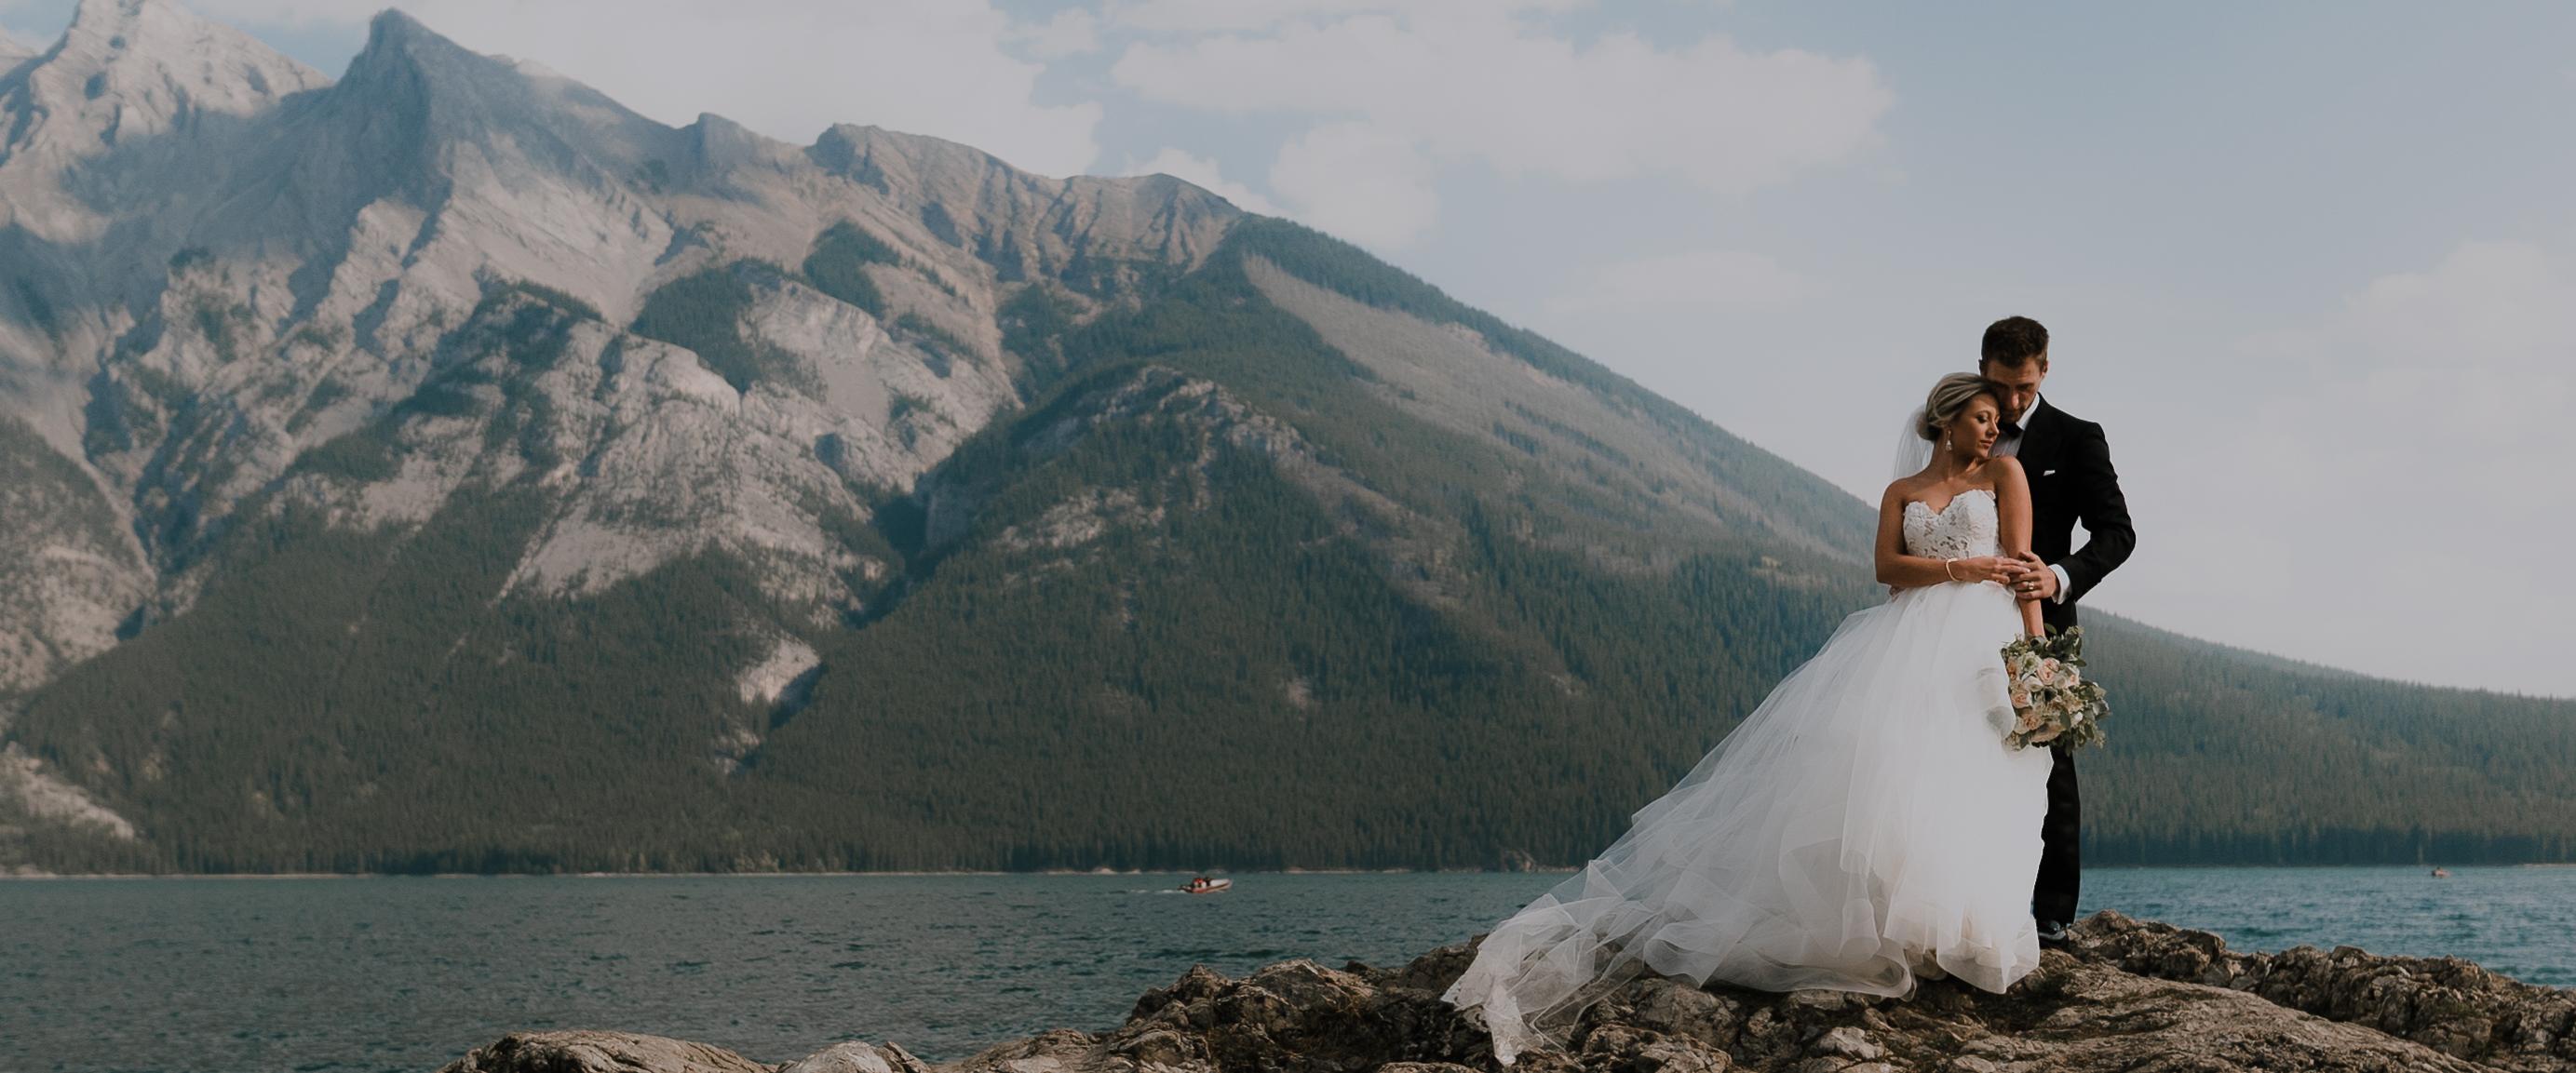 Haley + Brenden | Banff, Canada | Fairmont Banff Springs